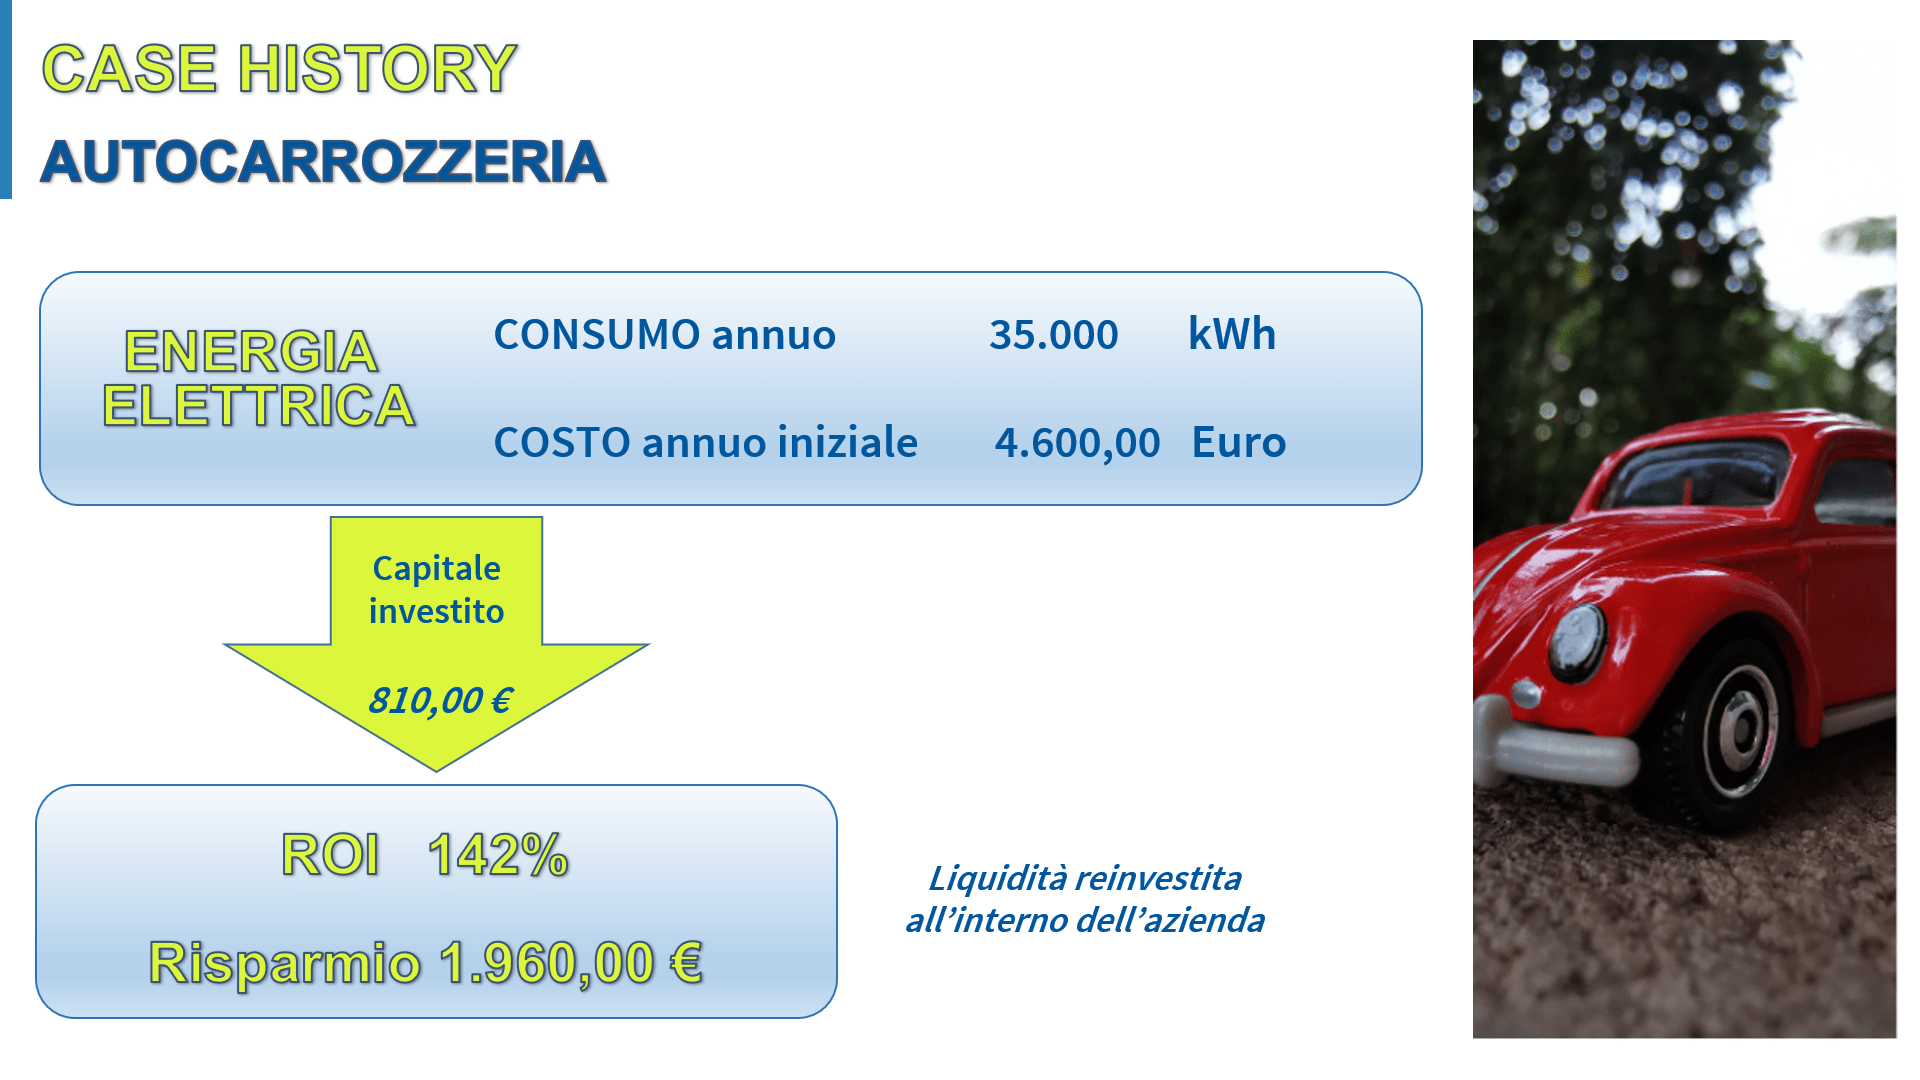 CASE HISTORY 5 – Autocarrozzeria